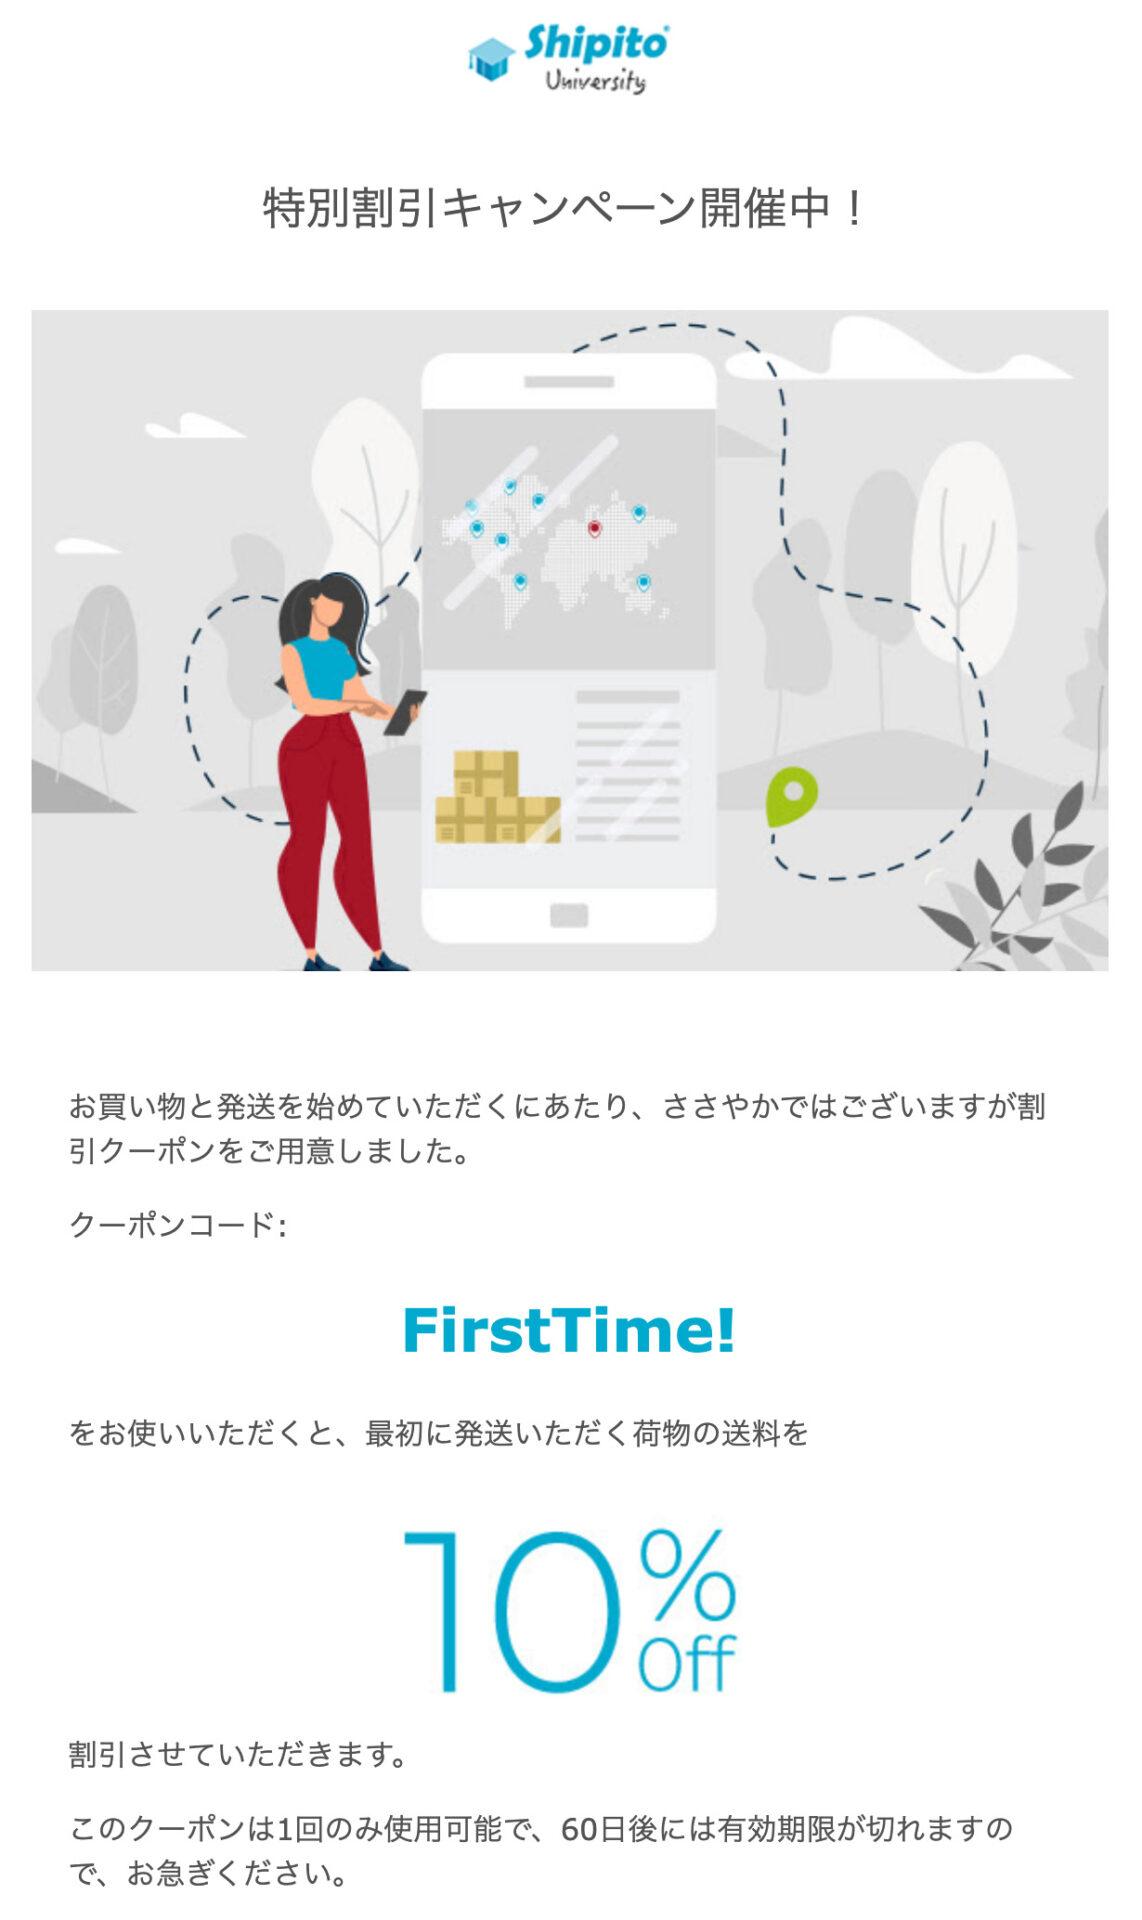 Shipitoの初回10%割引クーポンコード FirstTime!